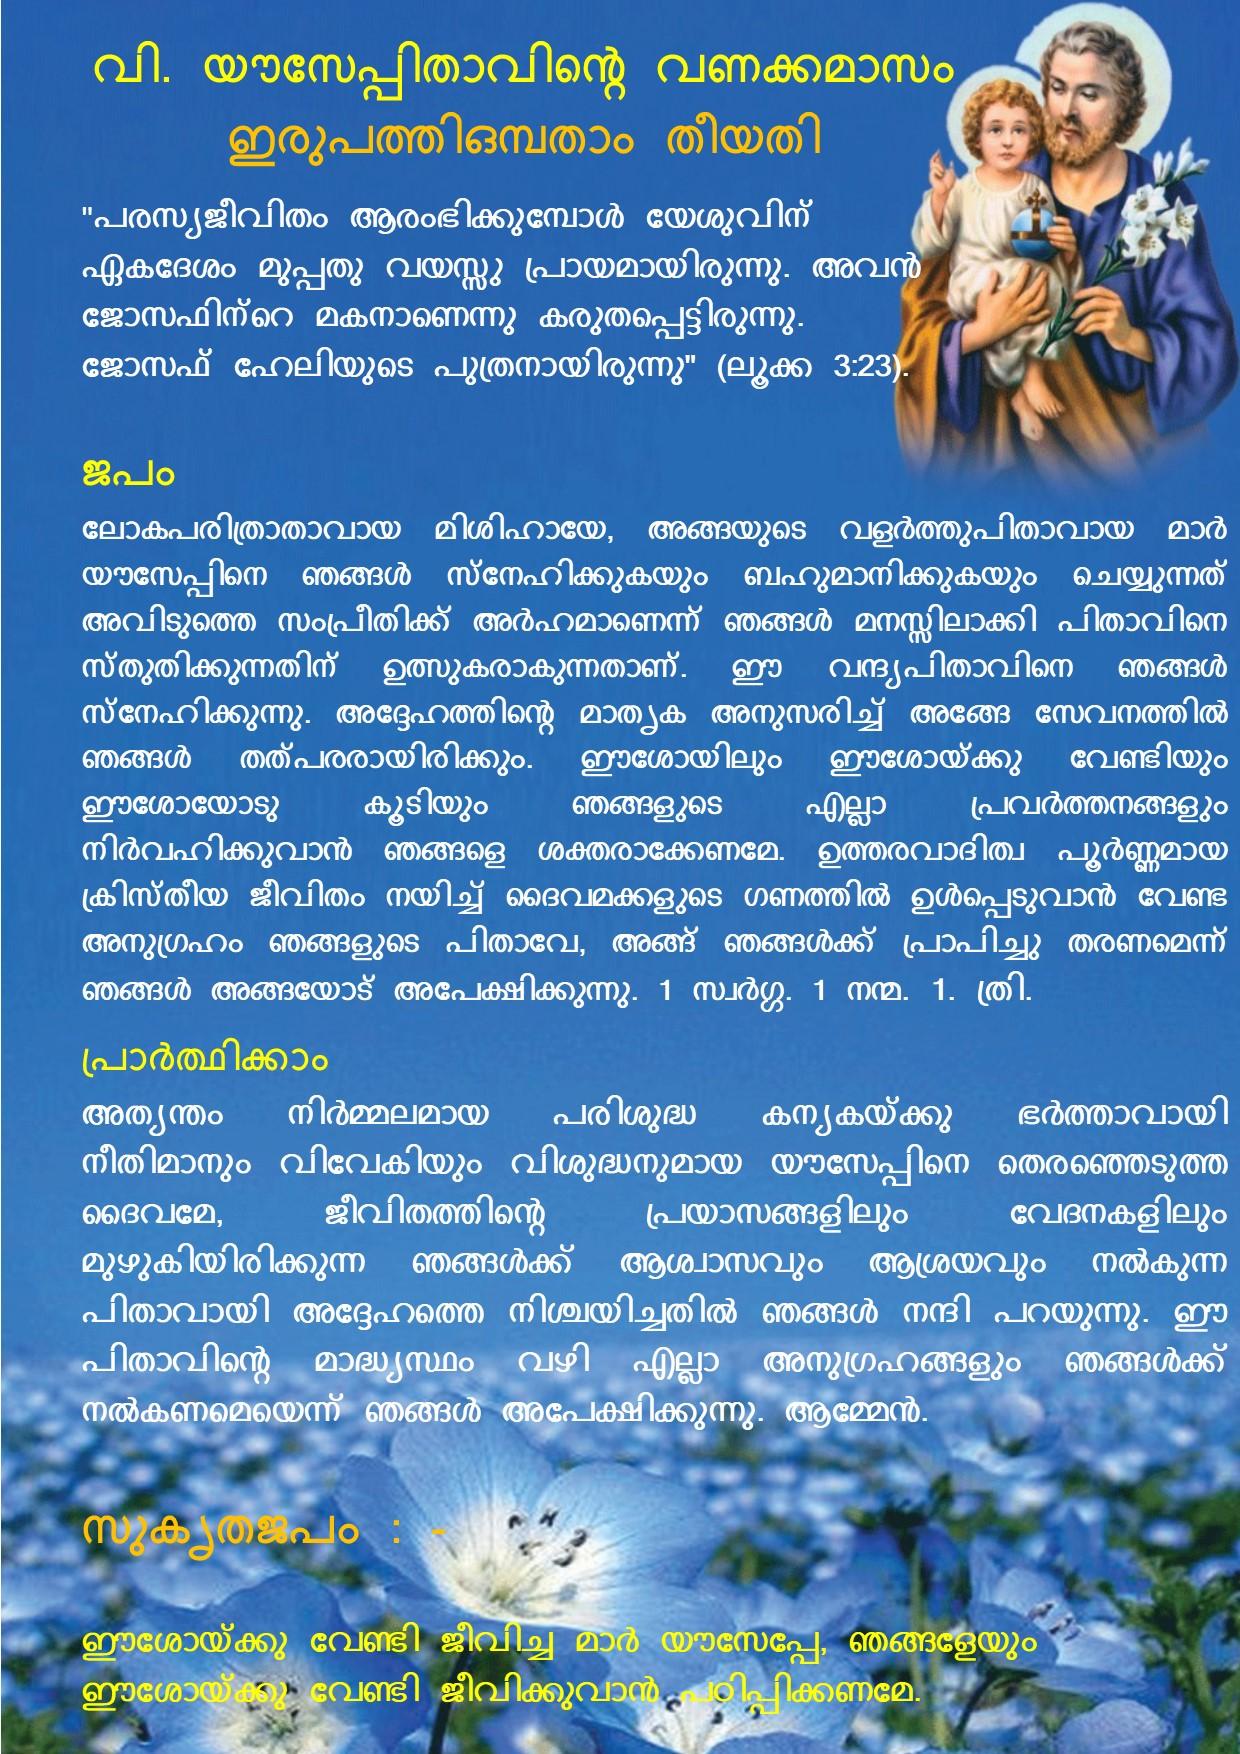 Vanakkamasam, St Joseph, March 29